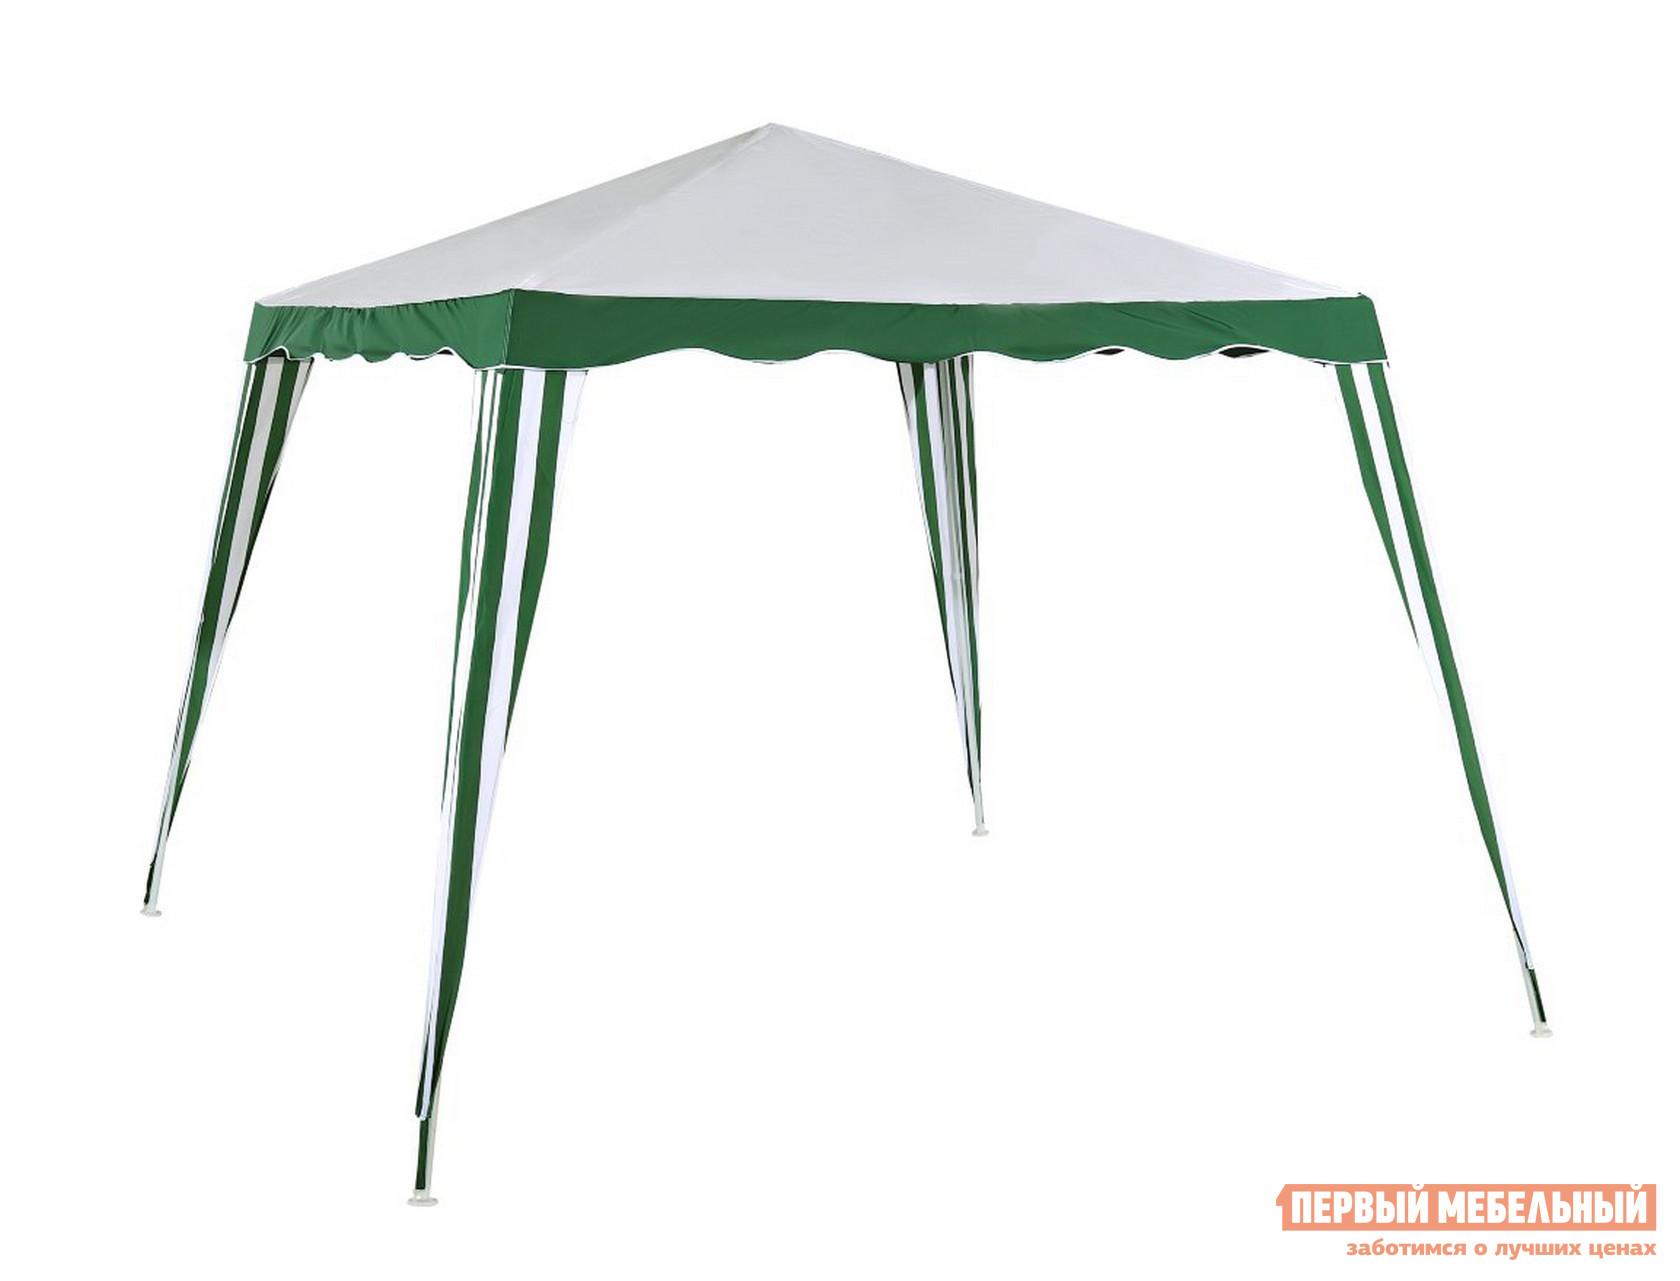 Шатер для дачи Лекс групп Шатер 1017 шатер для огорода